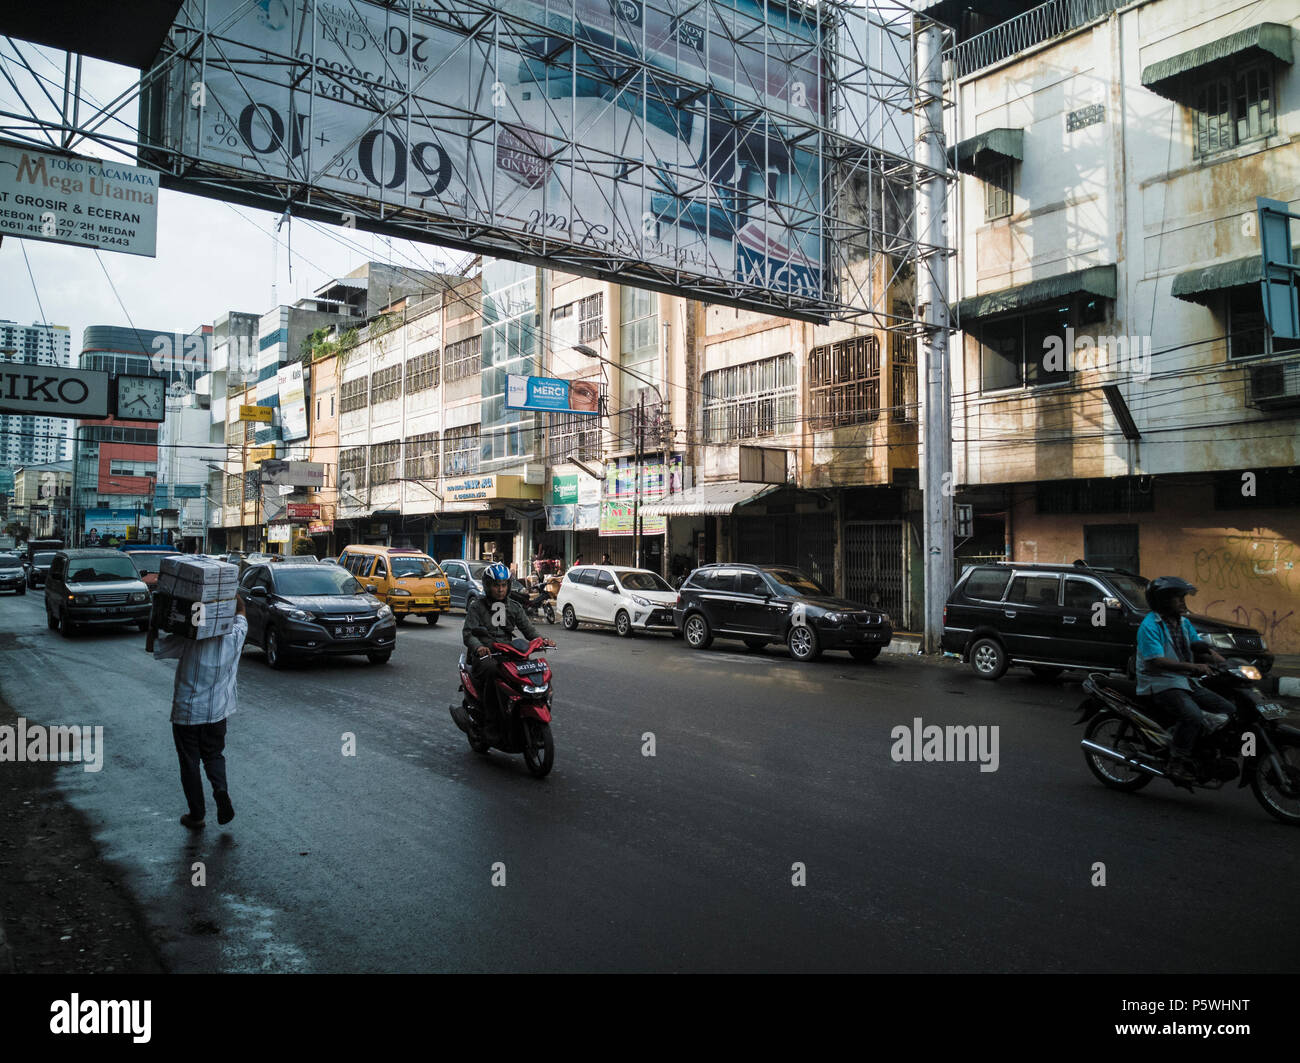 Afternoon urban street scene in Medan, Sumatra, Indonesia - Stock Image